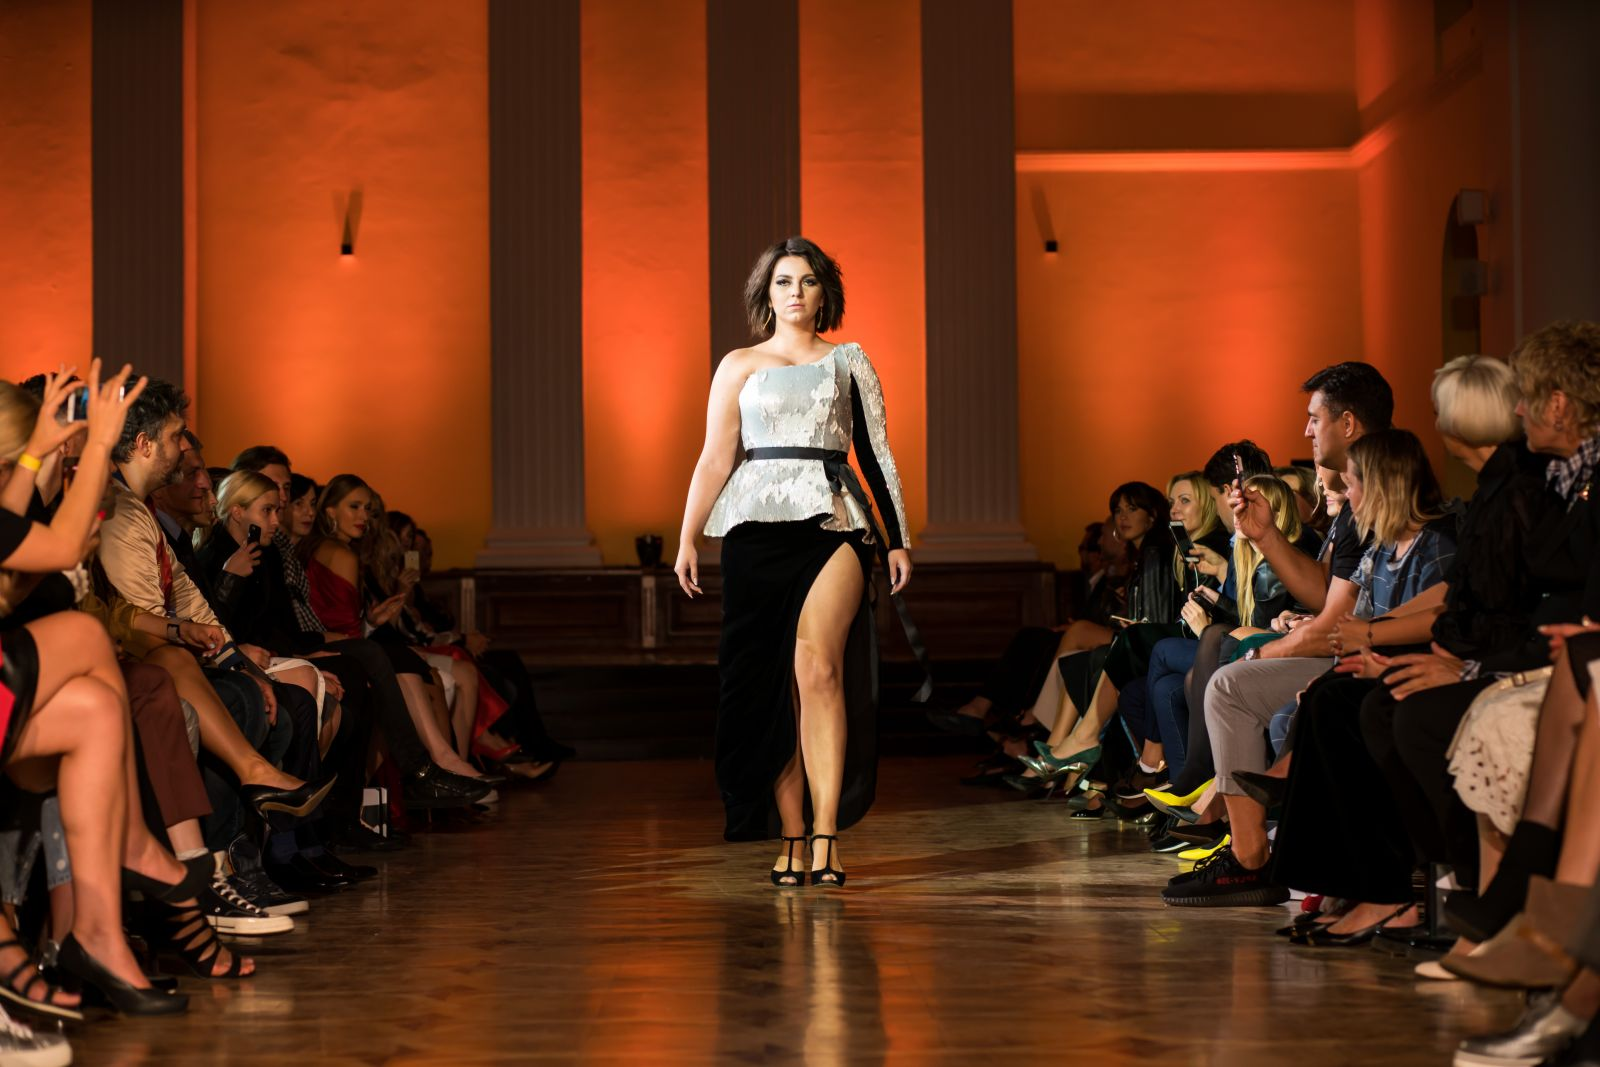 Андре Тан вывел на подиум девушек с фигурами plus-size